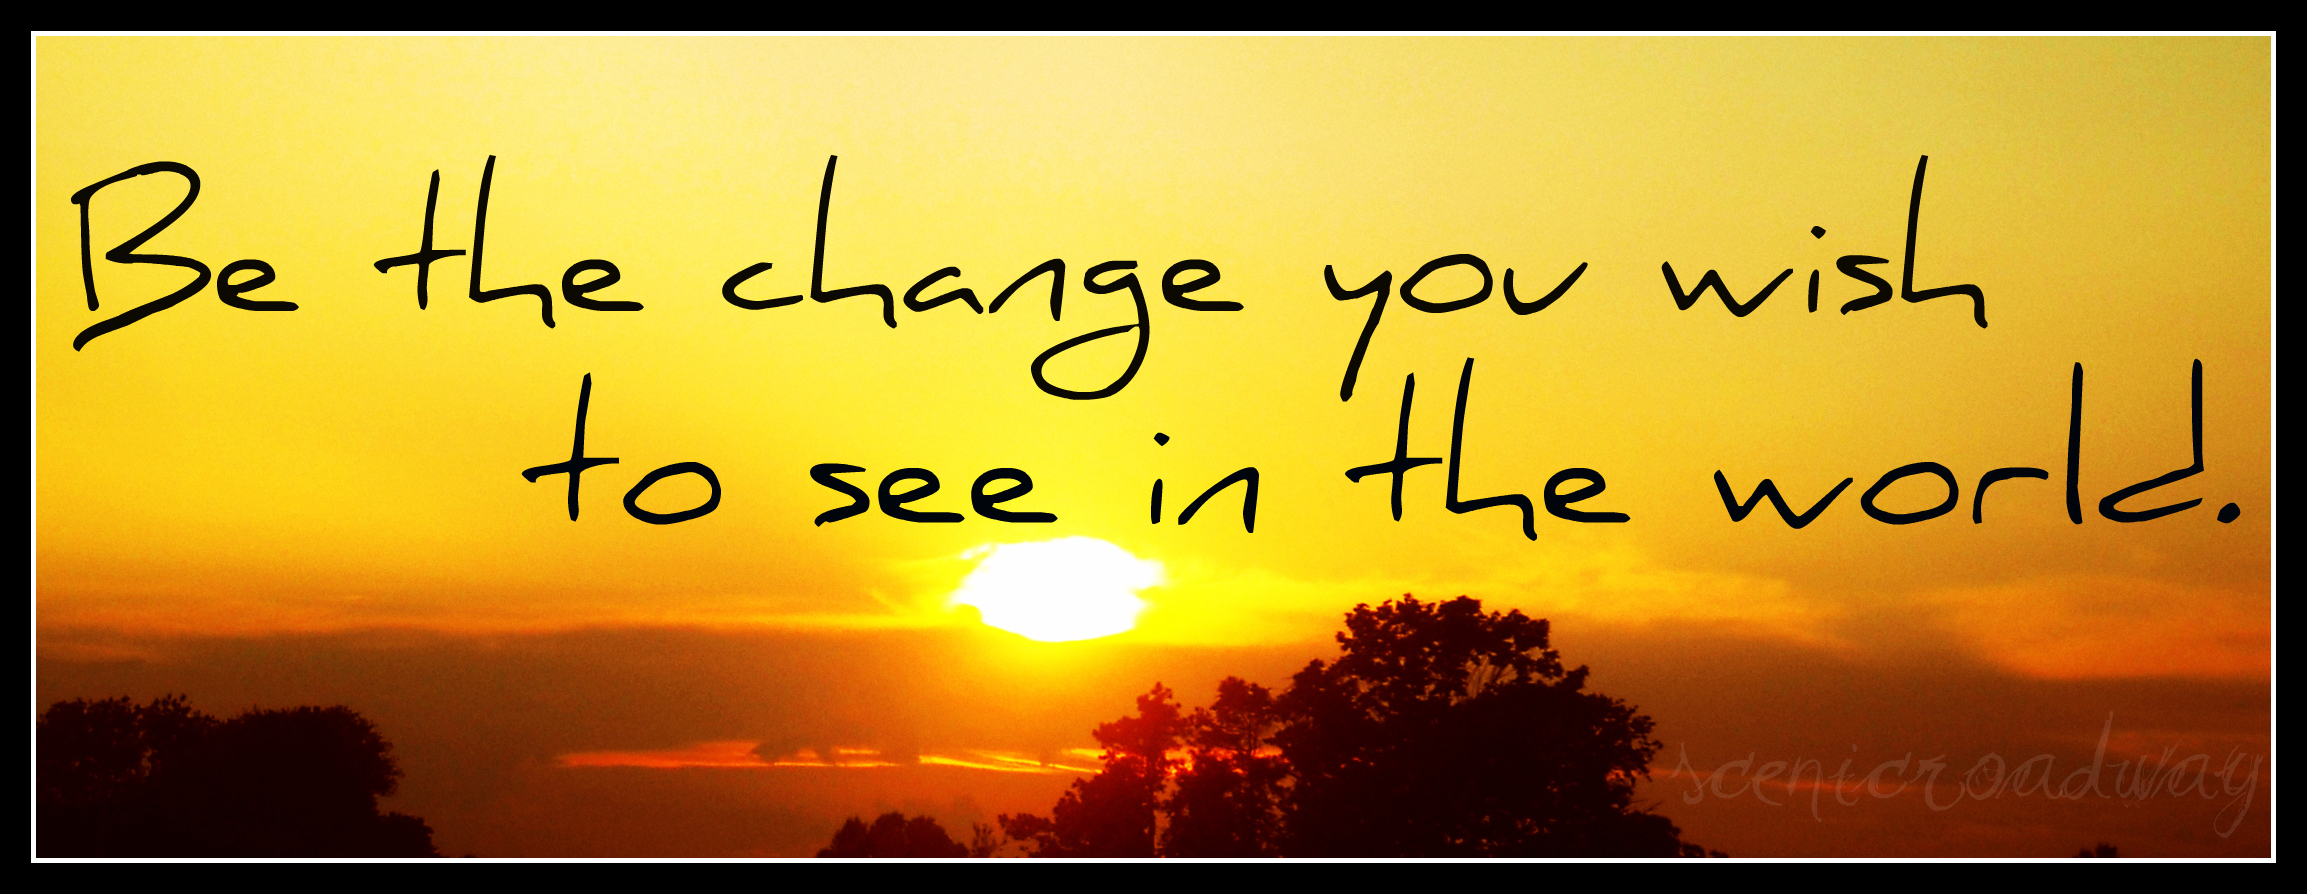 Change Inspirational Quotes Life Quotesgram